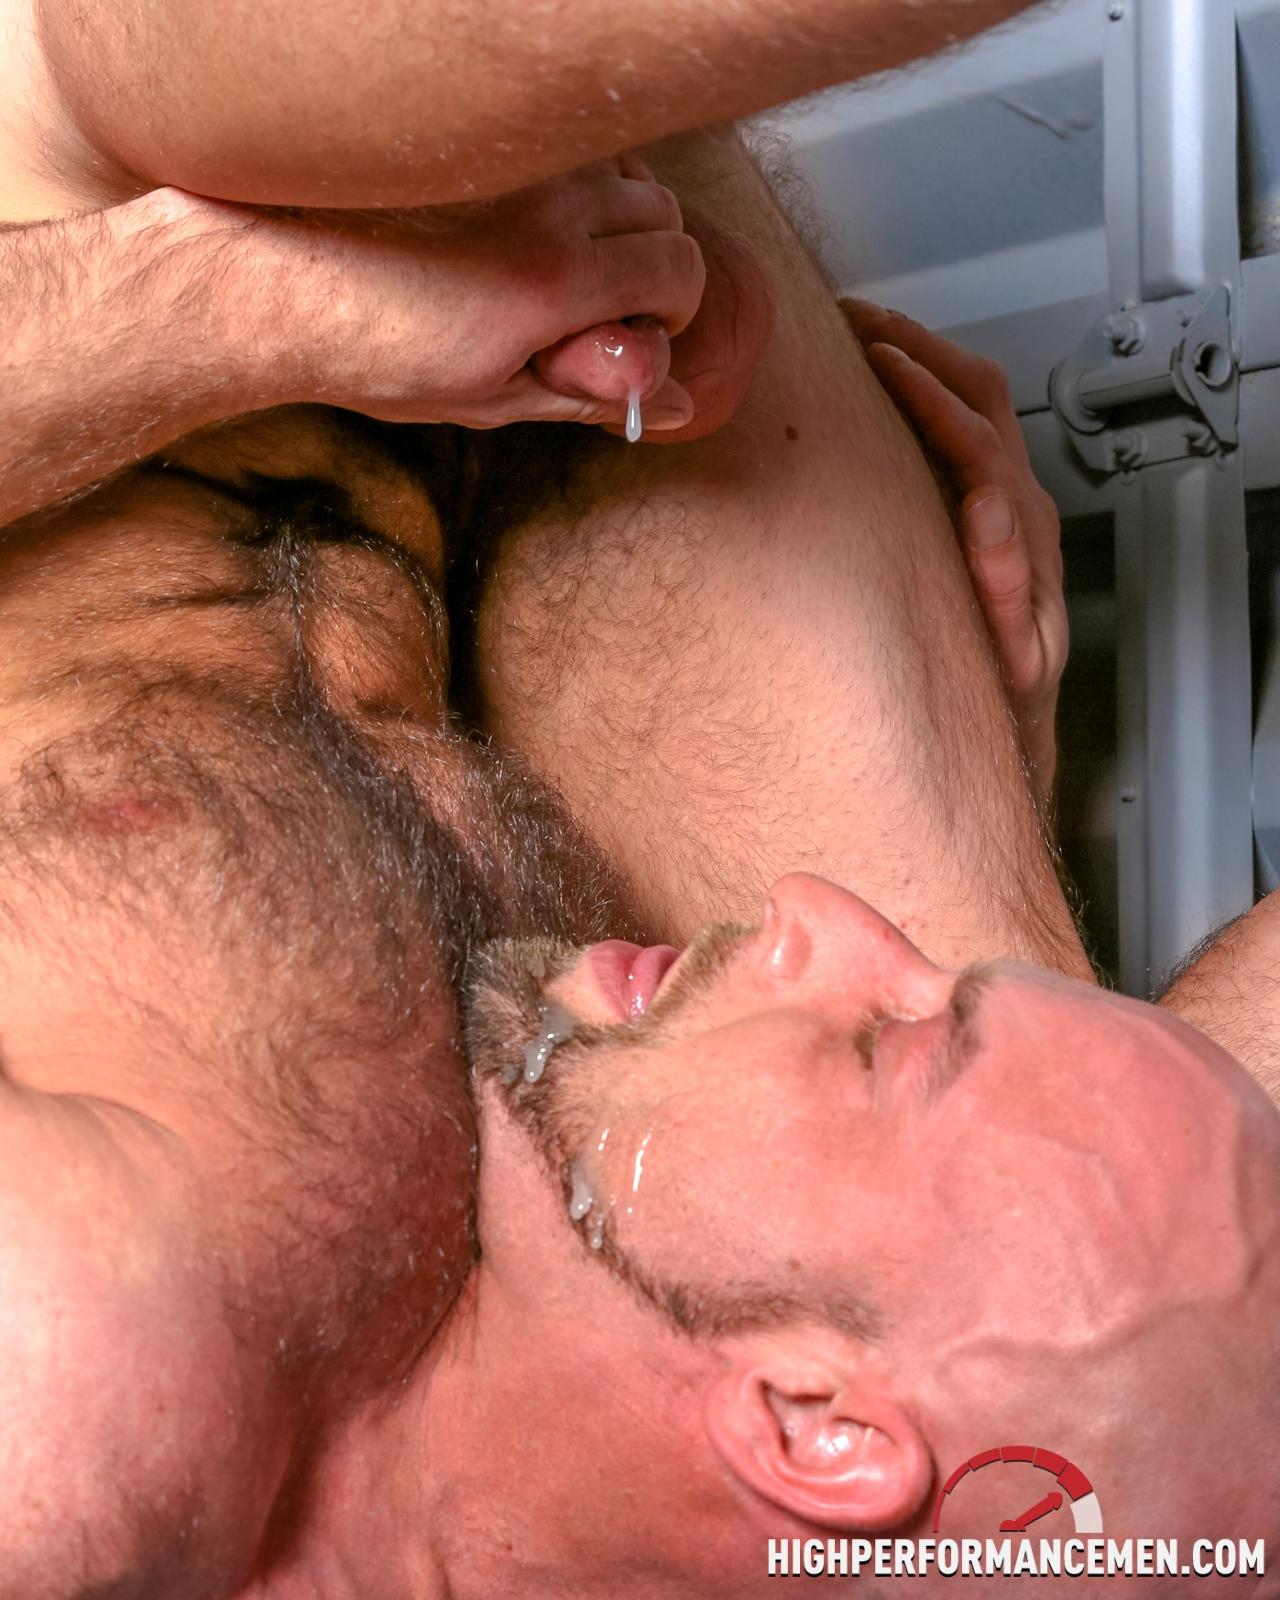 Men models gay sex cock photos first